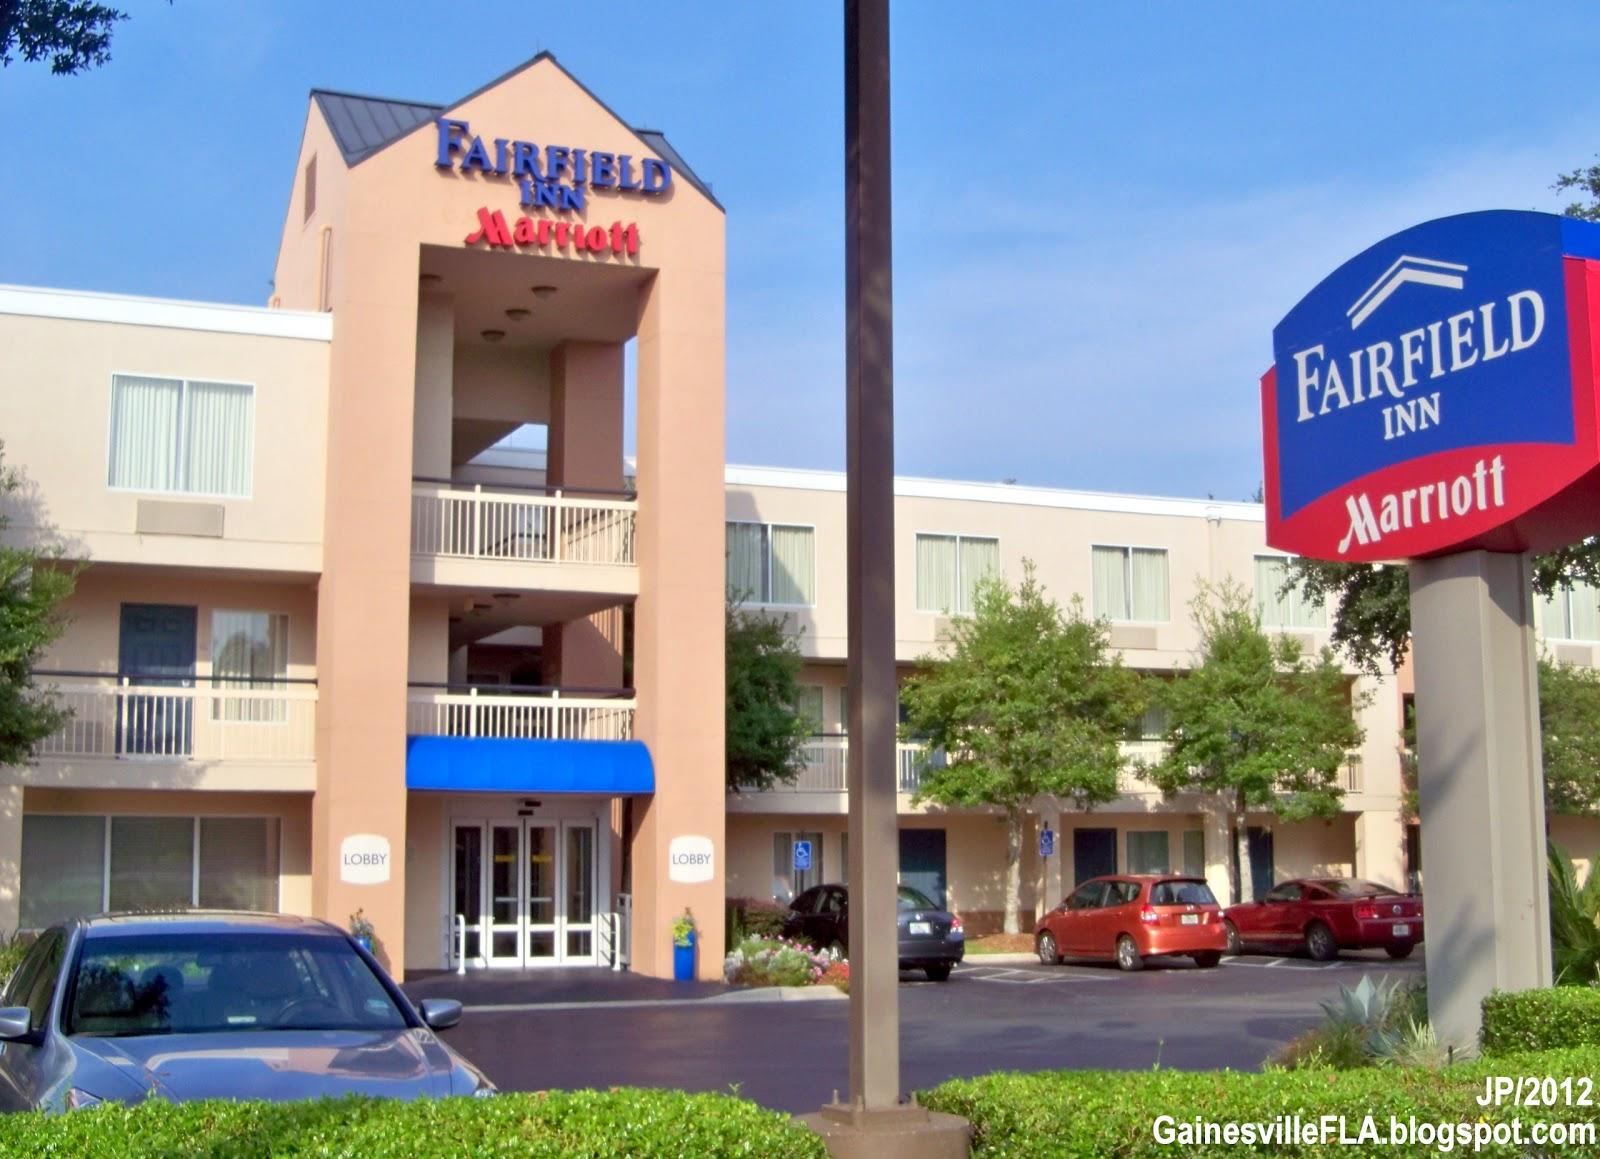 Fairfield Inn Gainesville Florida Marriott Hotel Nw 4th Blvd By Alachua County Fl